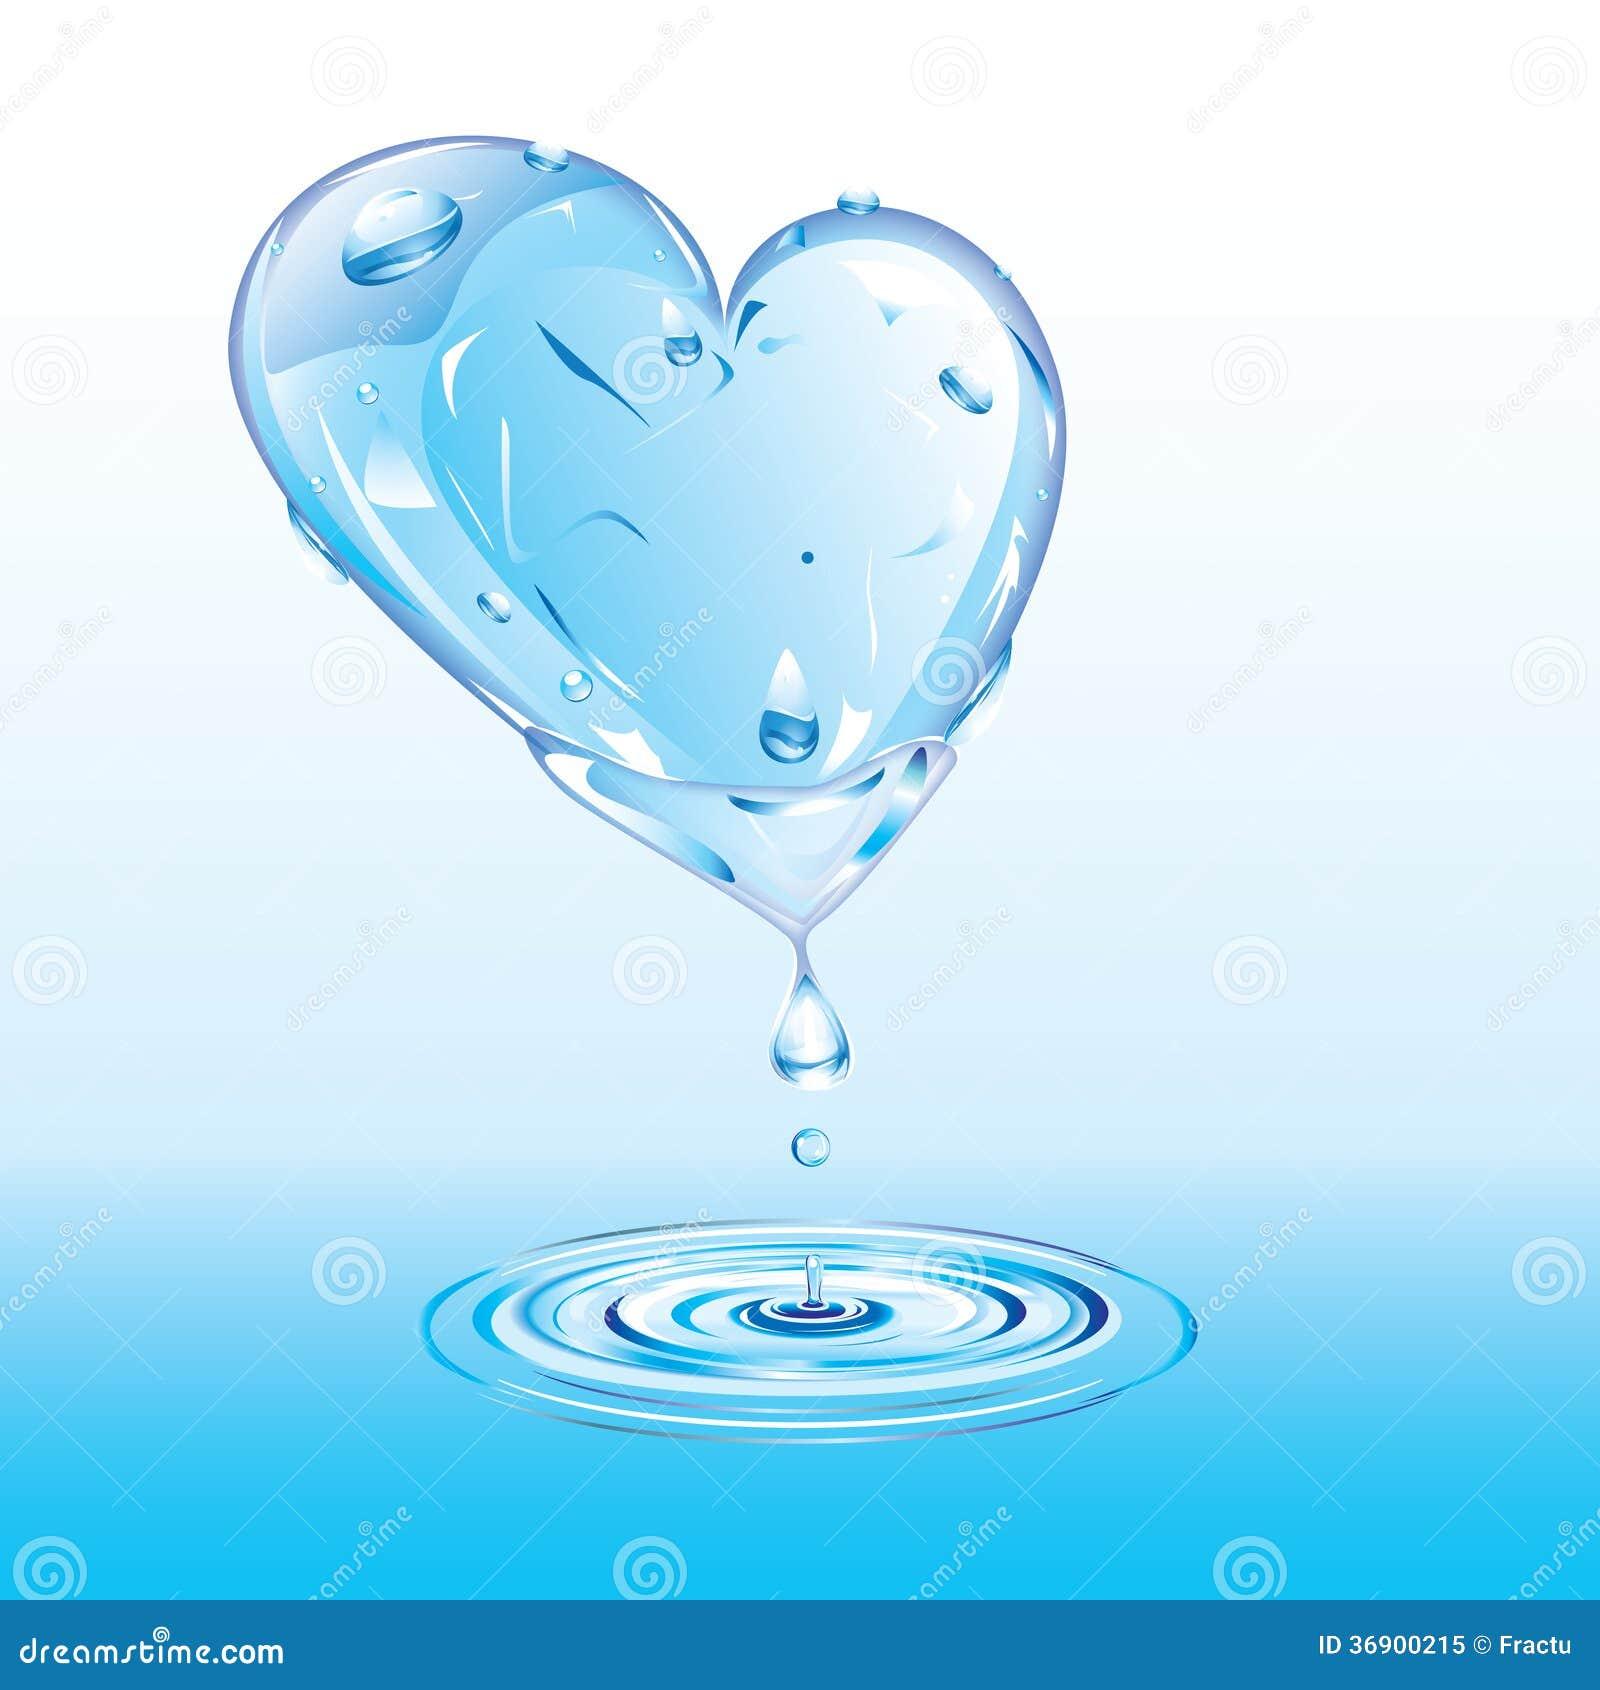 heart of ice by Ka-Kind on deviantART | Ice heart, Heart